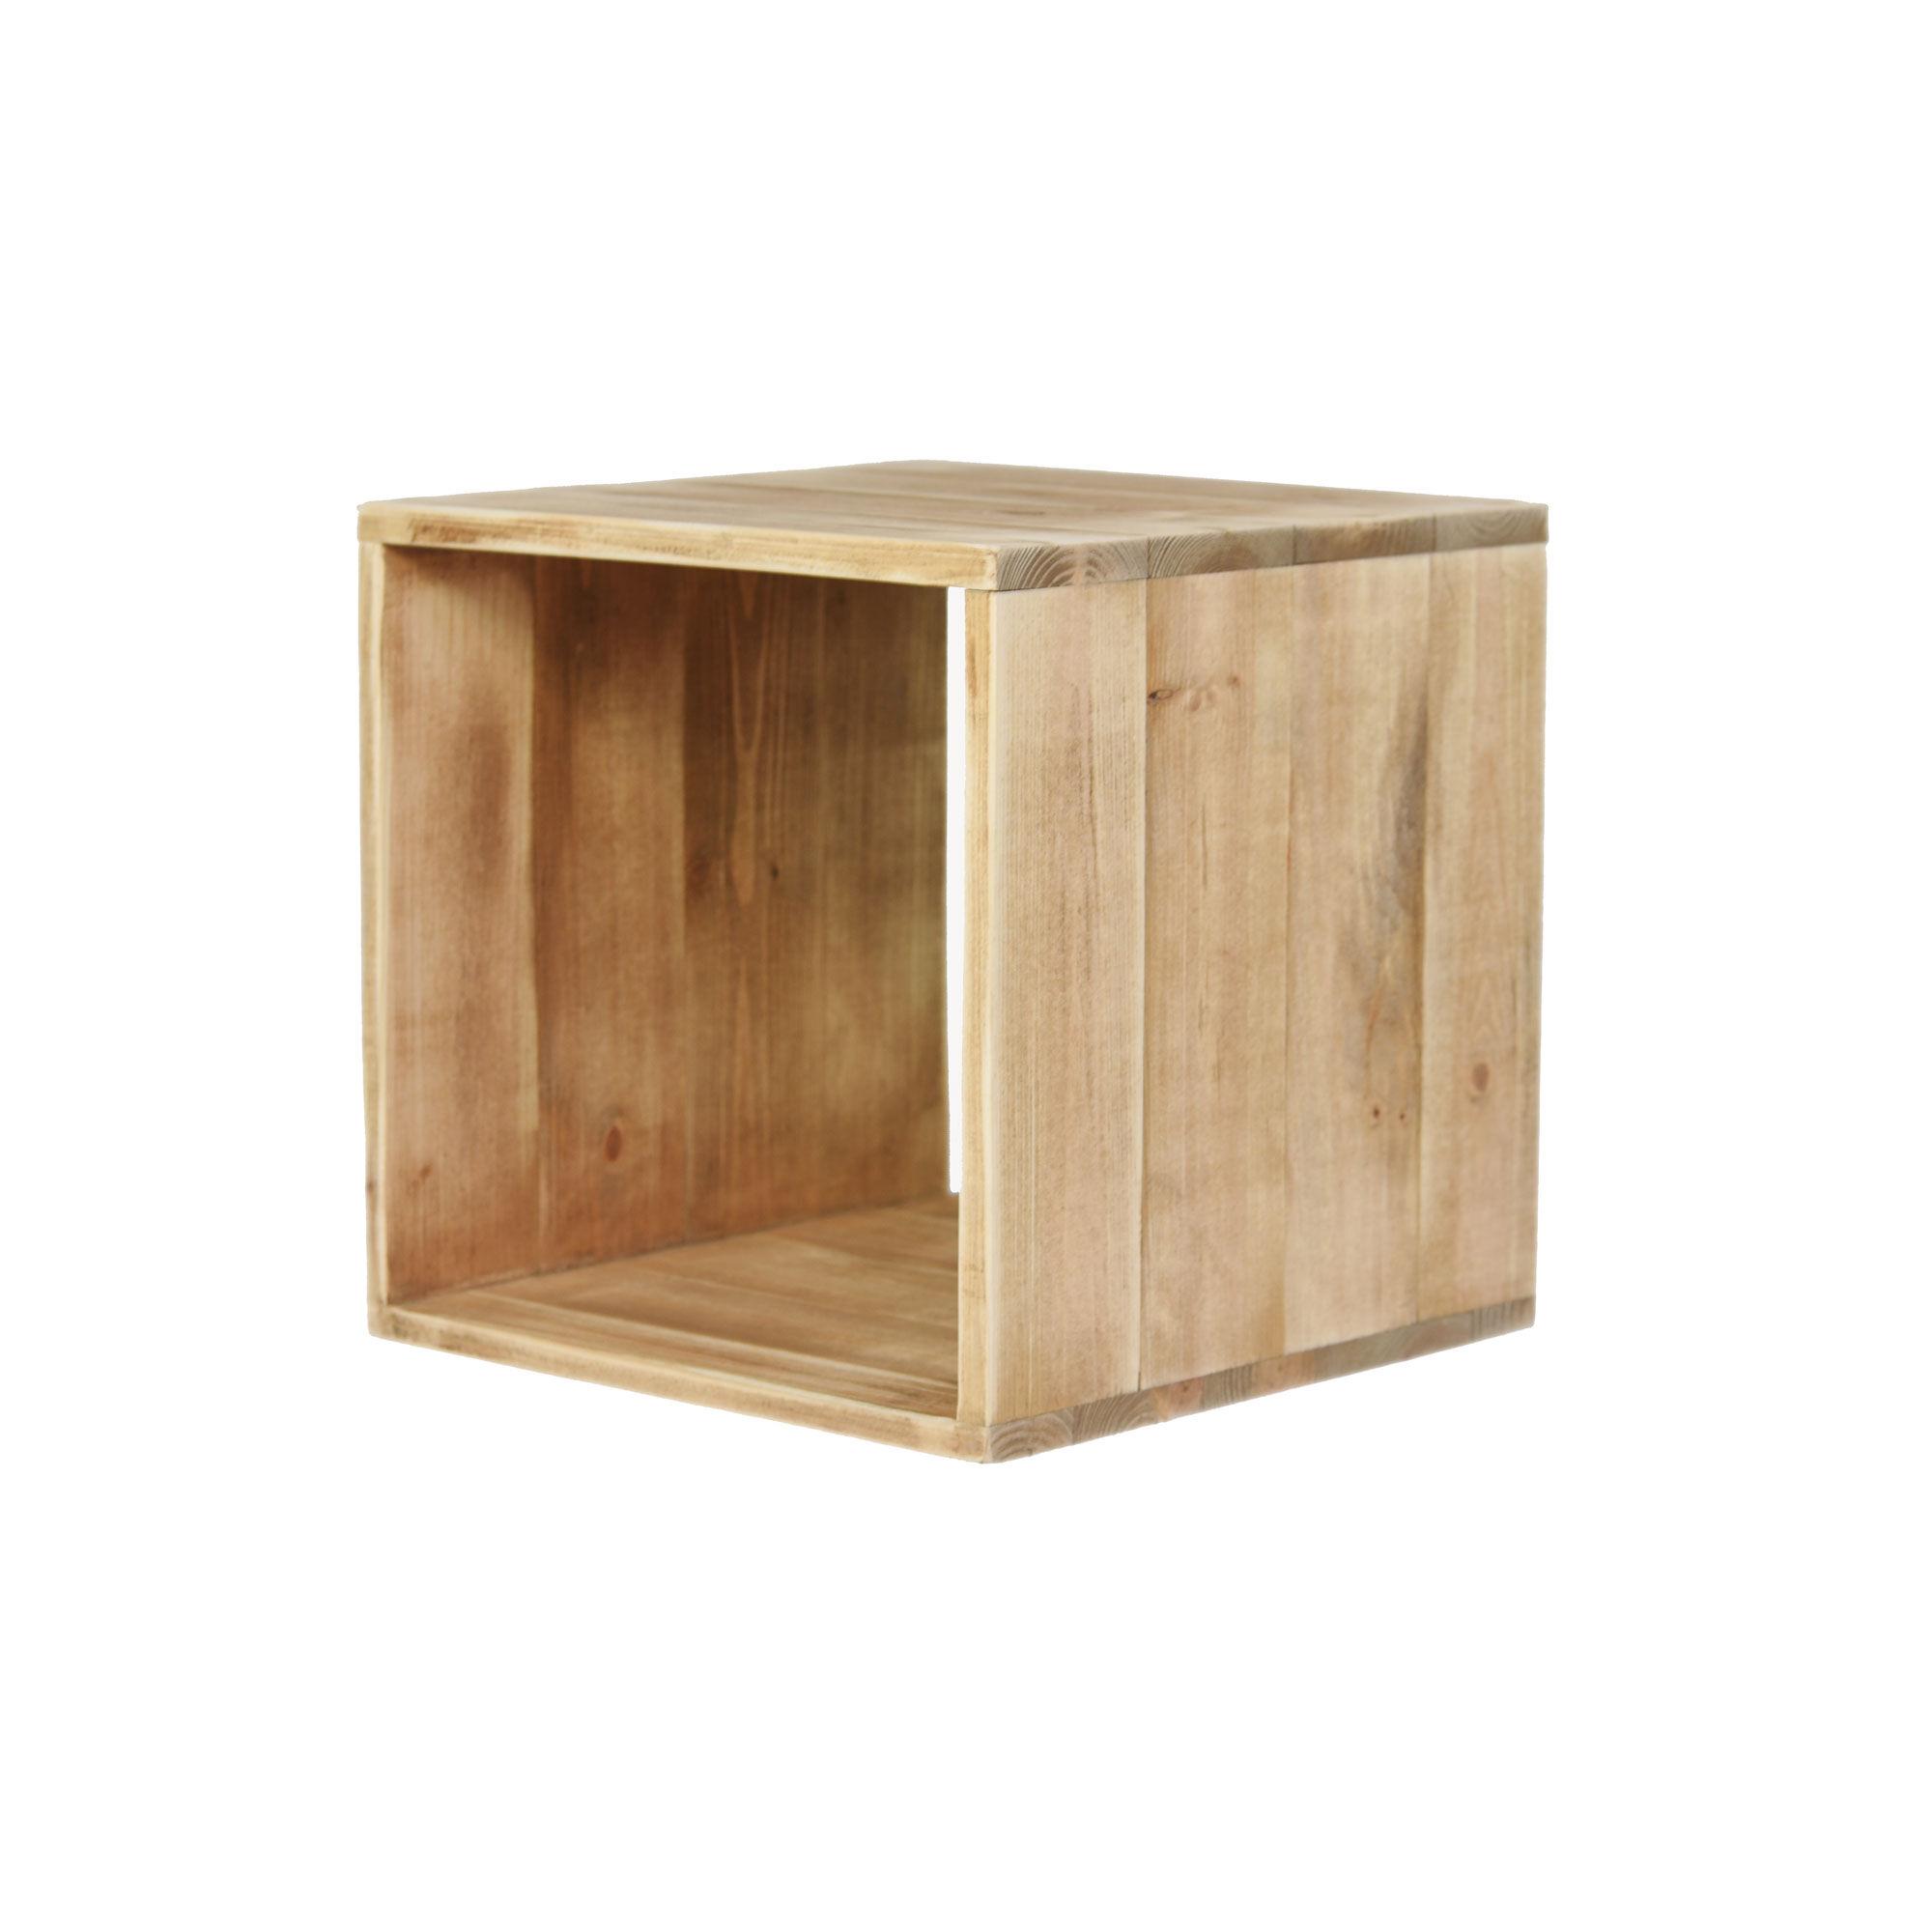 Dendro Cube en pin massif bois vieilli